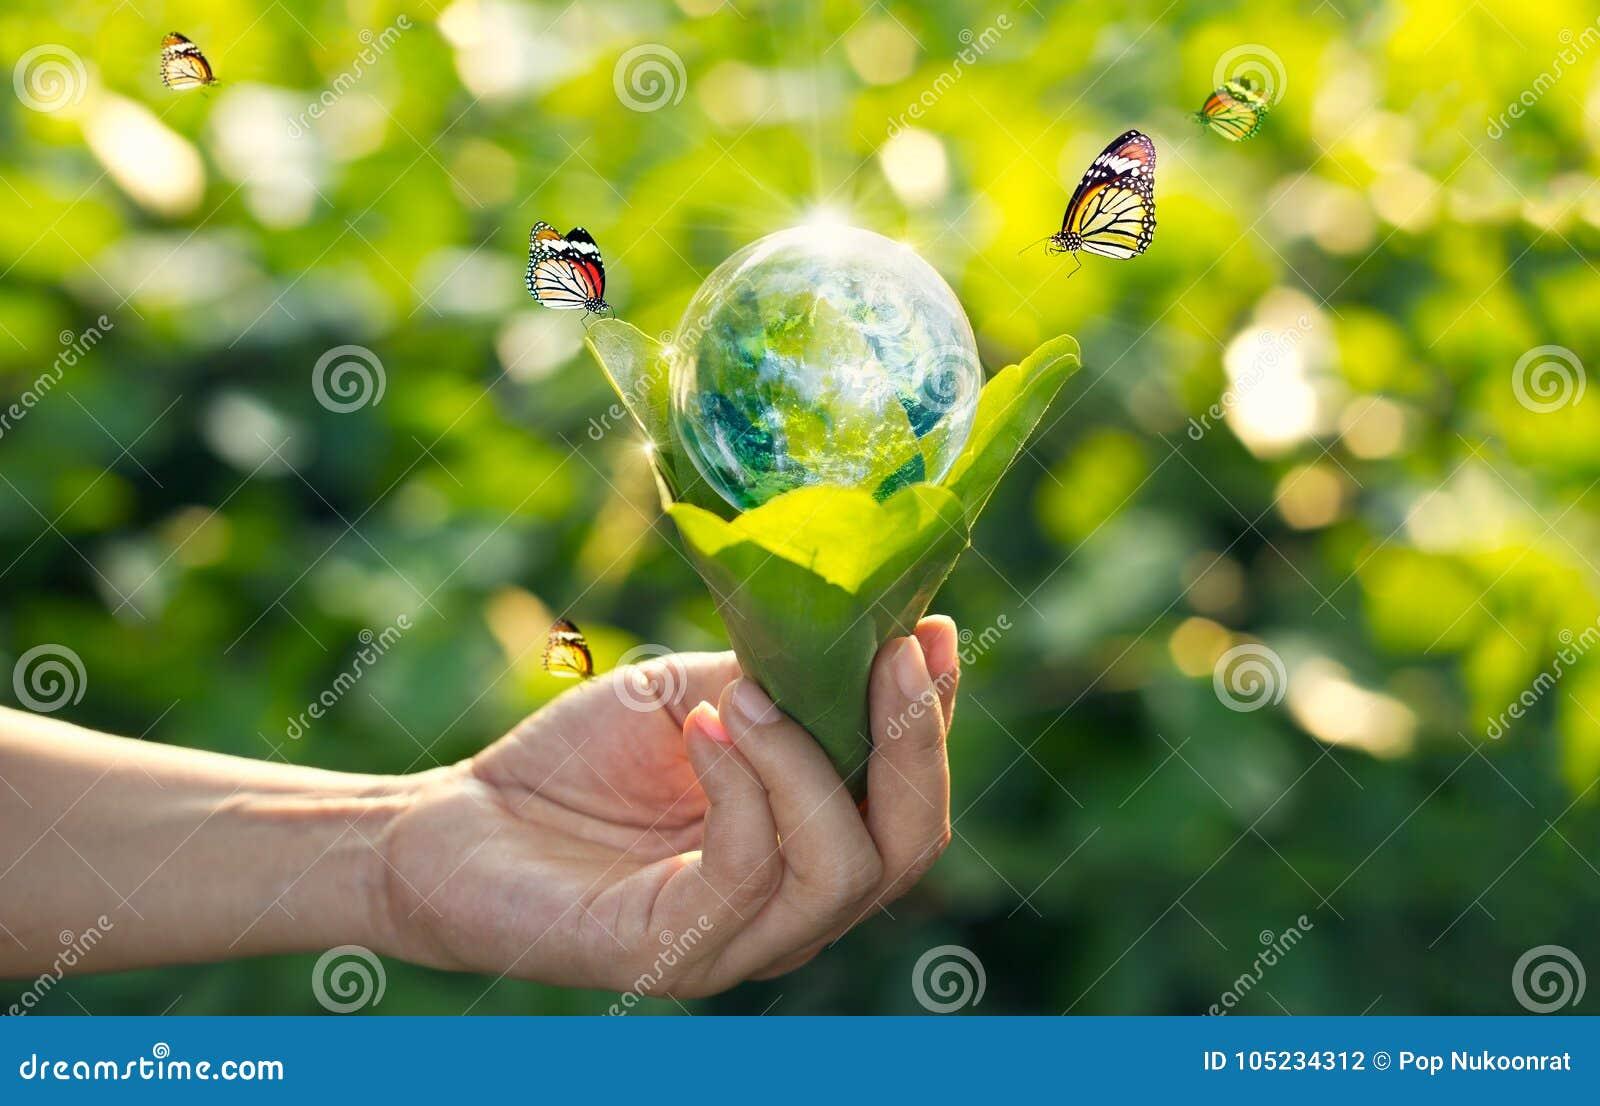 Saving energy concept, Earth day